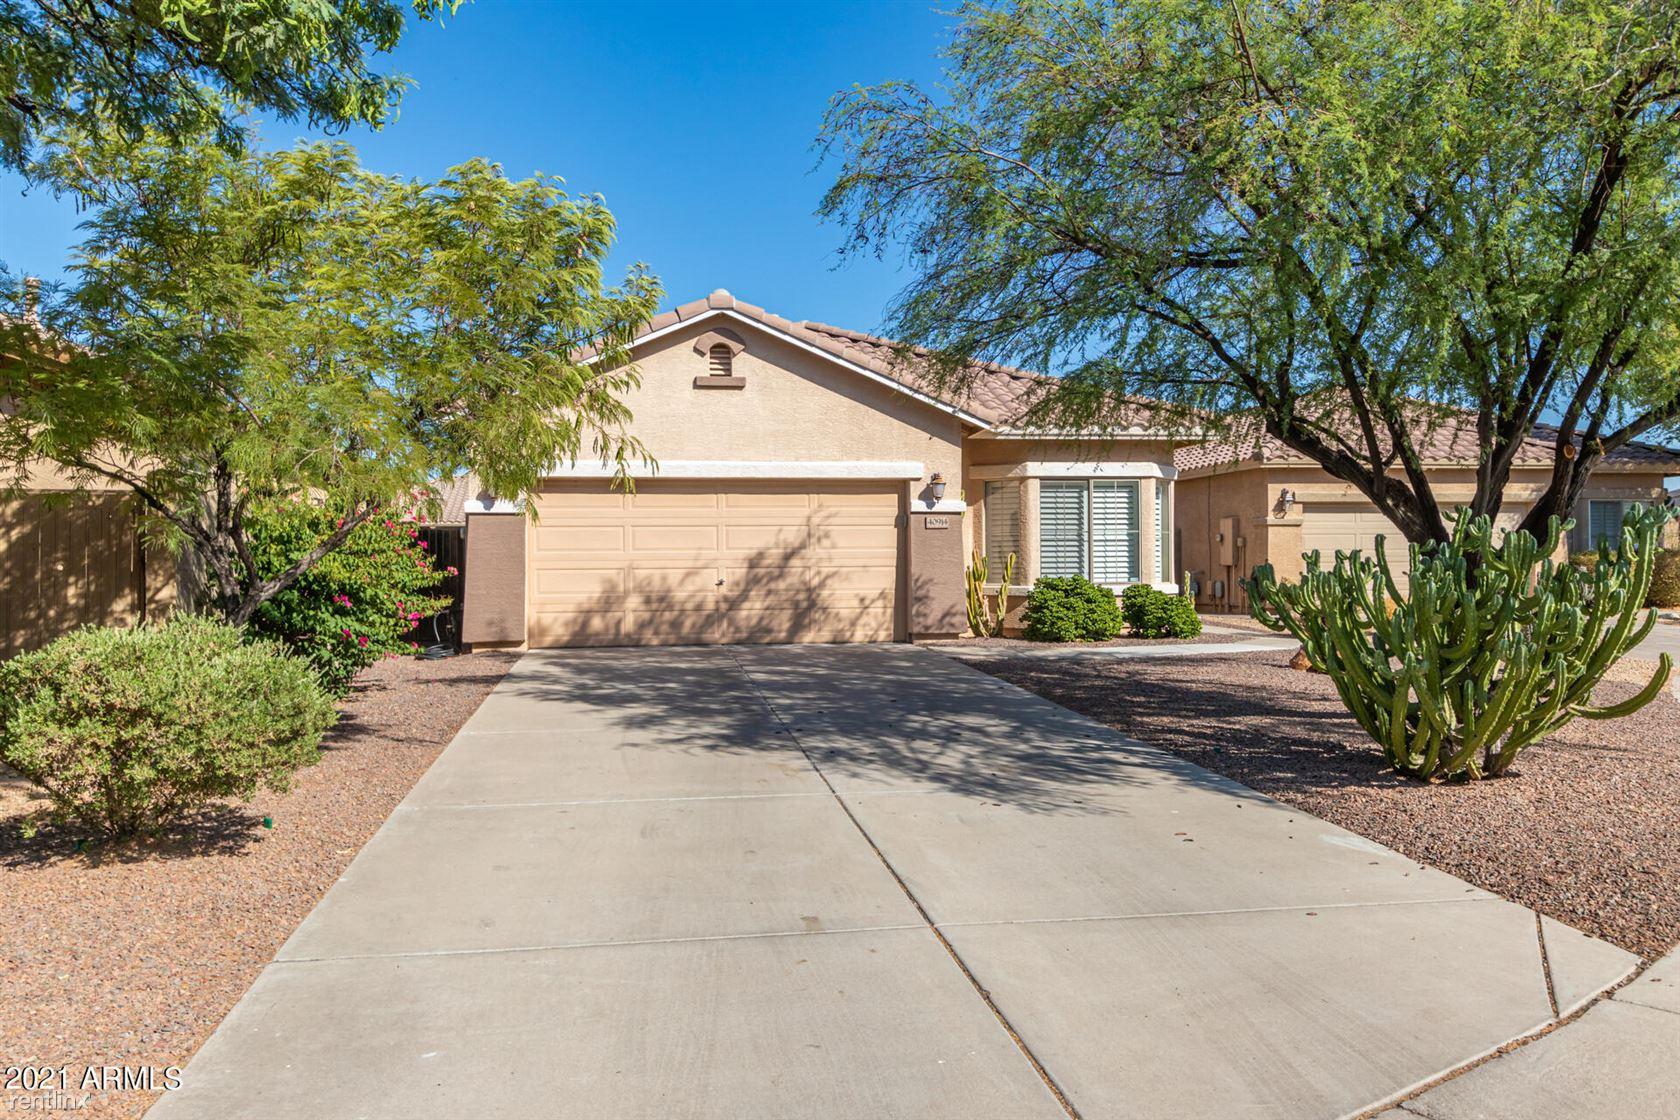 40914 N BARNUM Way, Phoenix, AZ - 2,955 USD/ month